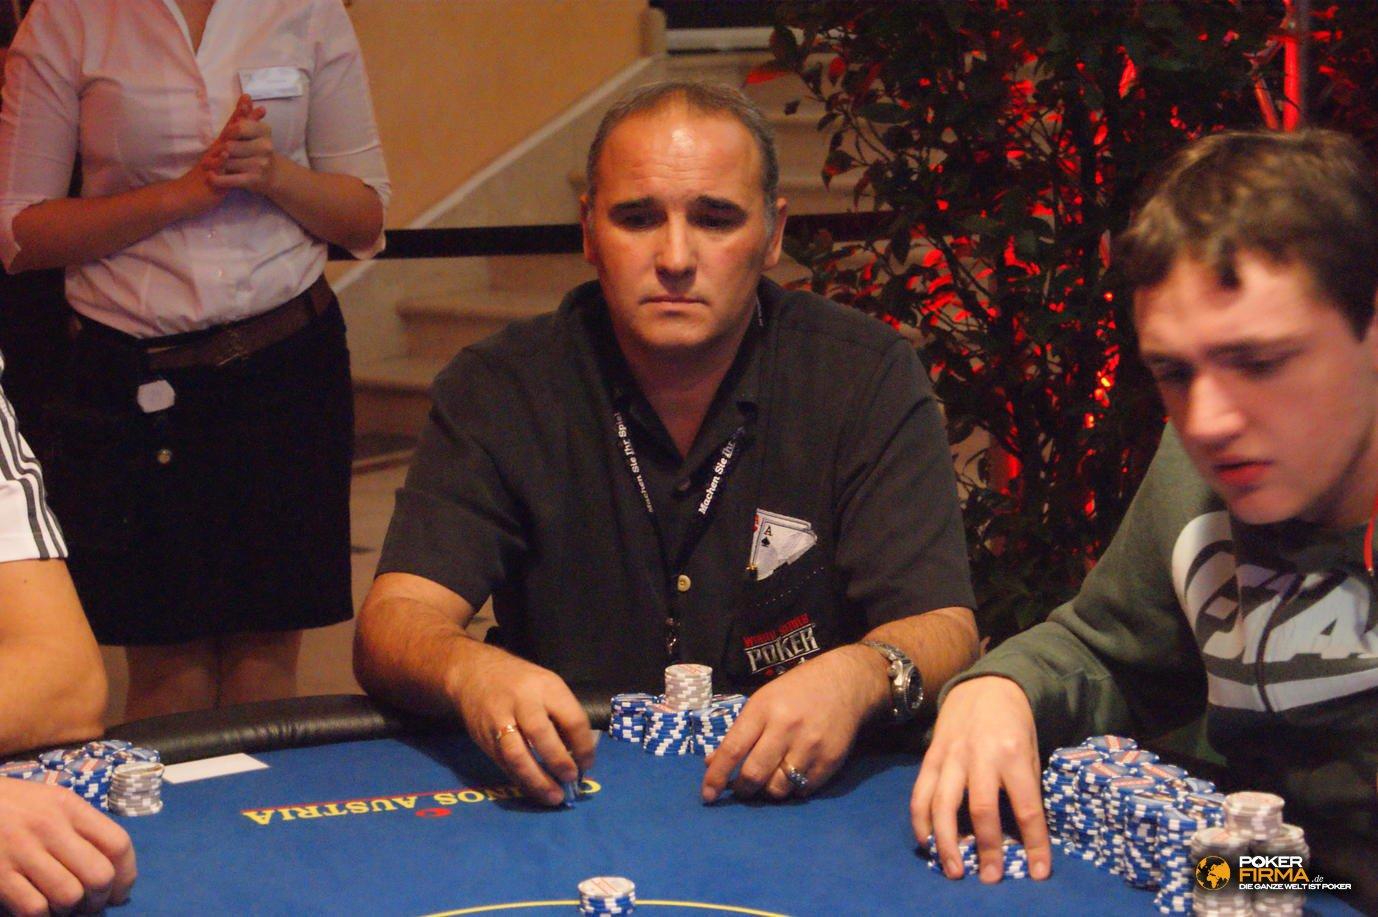 Poker_EM_2000_NLH_FT_271011_Michael_Jambrits